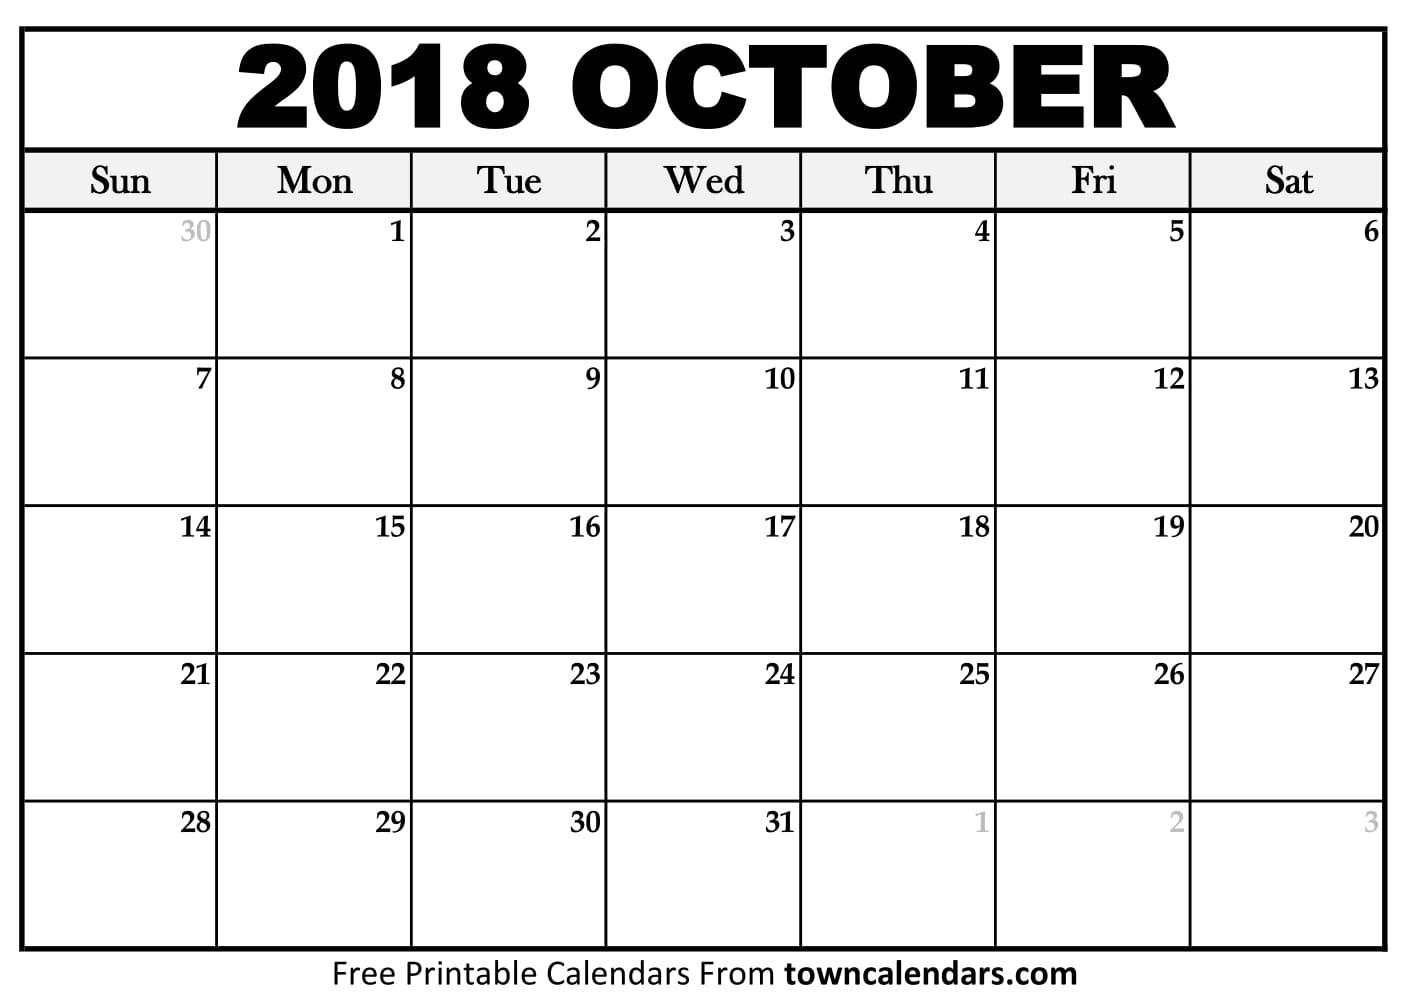 Calendar For October 2018